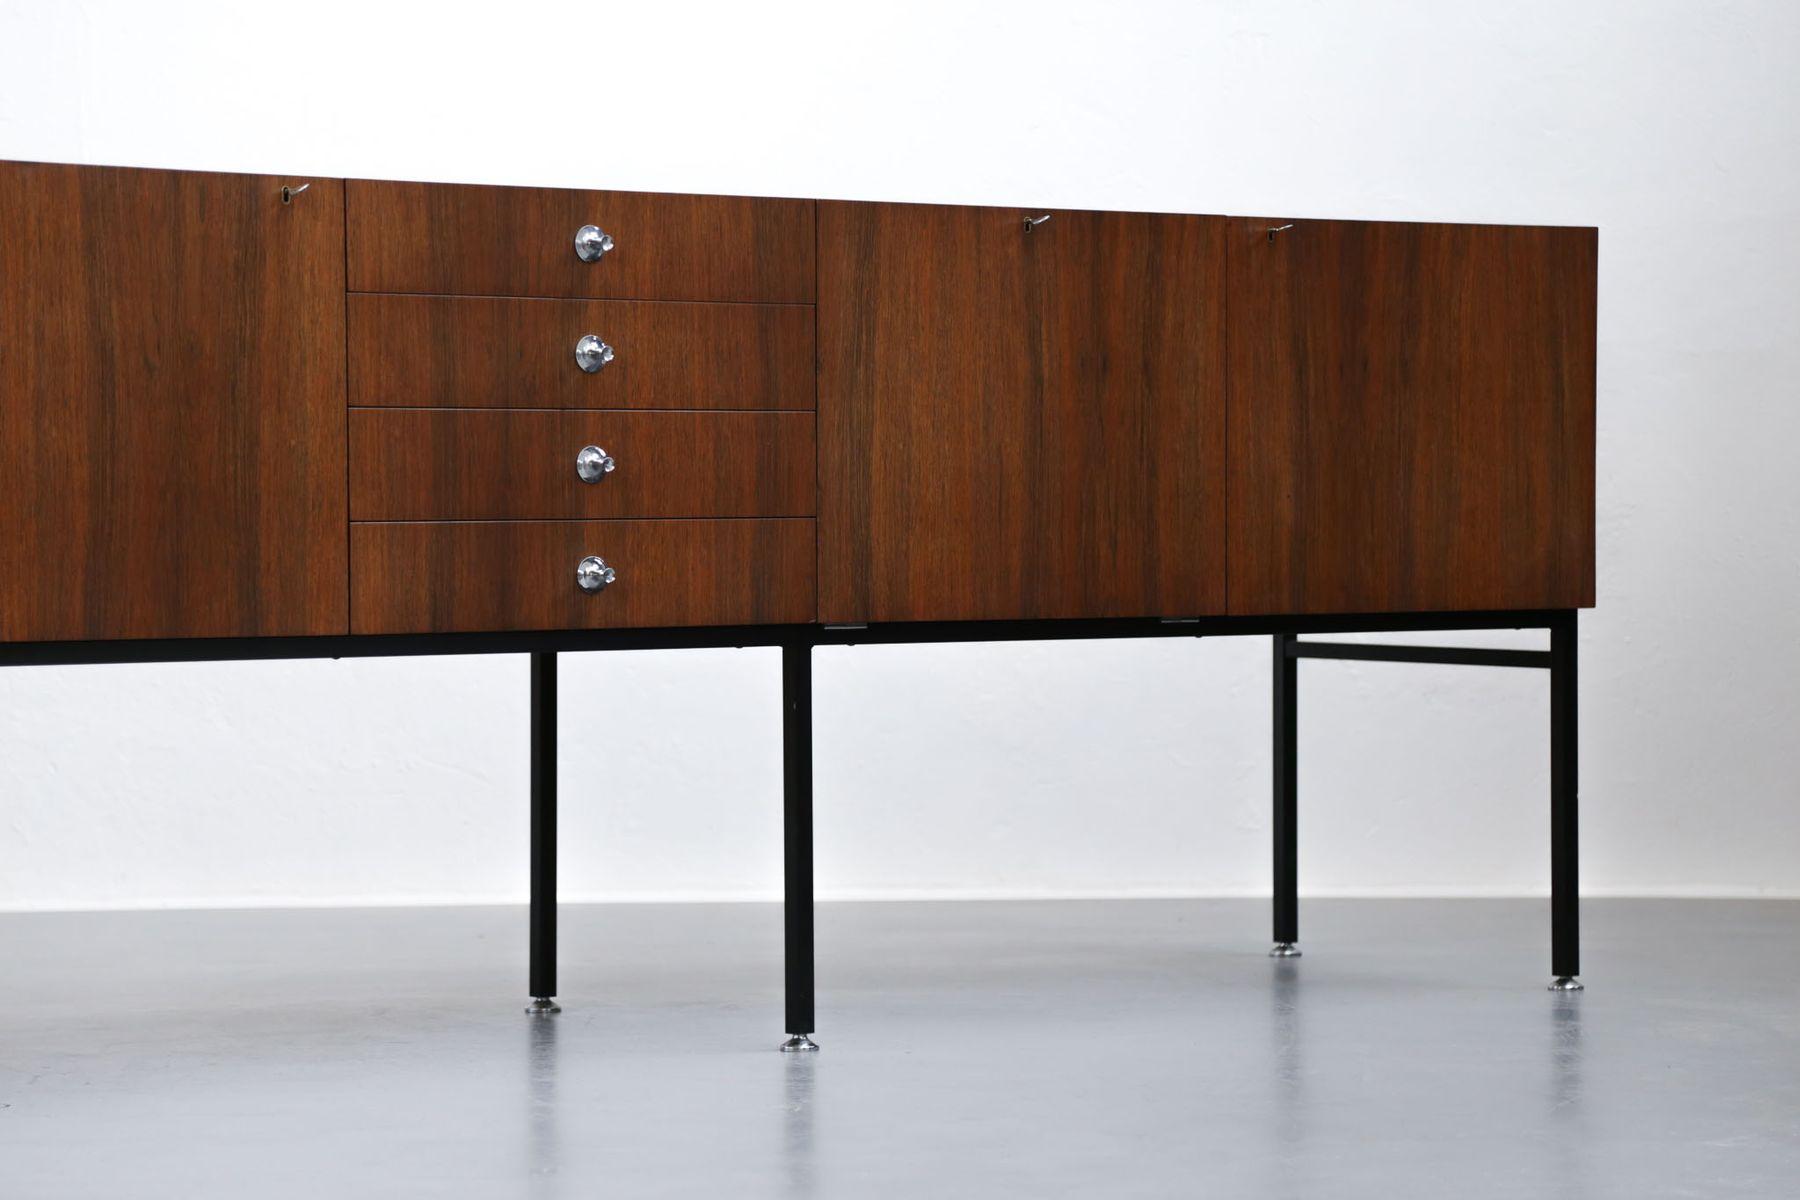 franz sisches vintage sideboard von alain richard f r. Black Bedroom Furniture Sets. Home Design Ideas